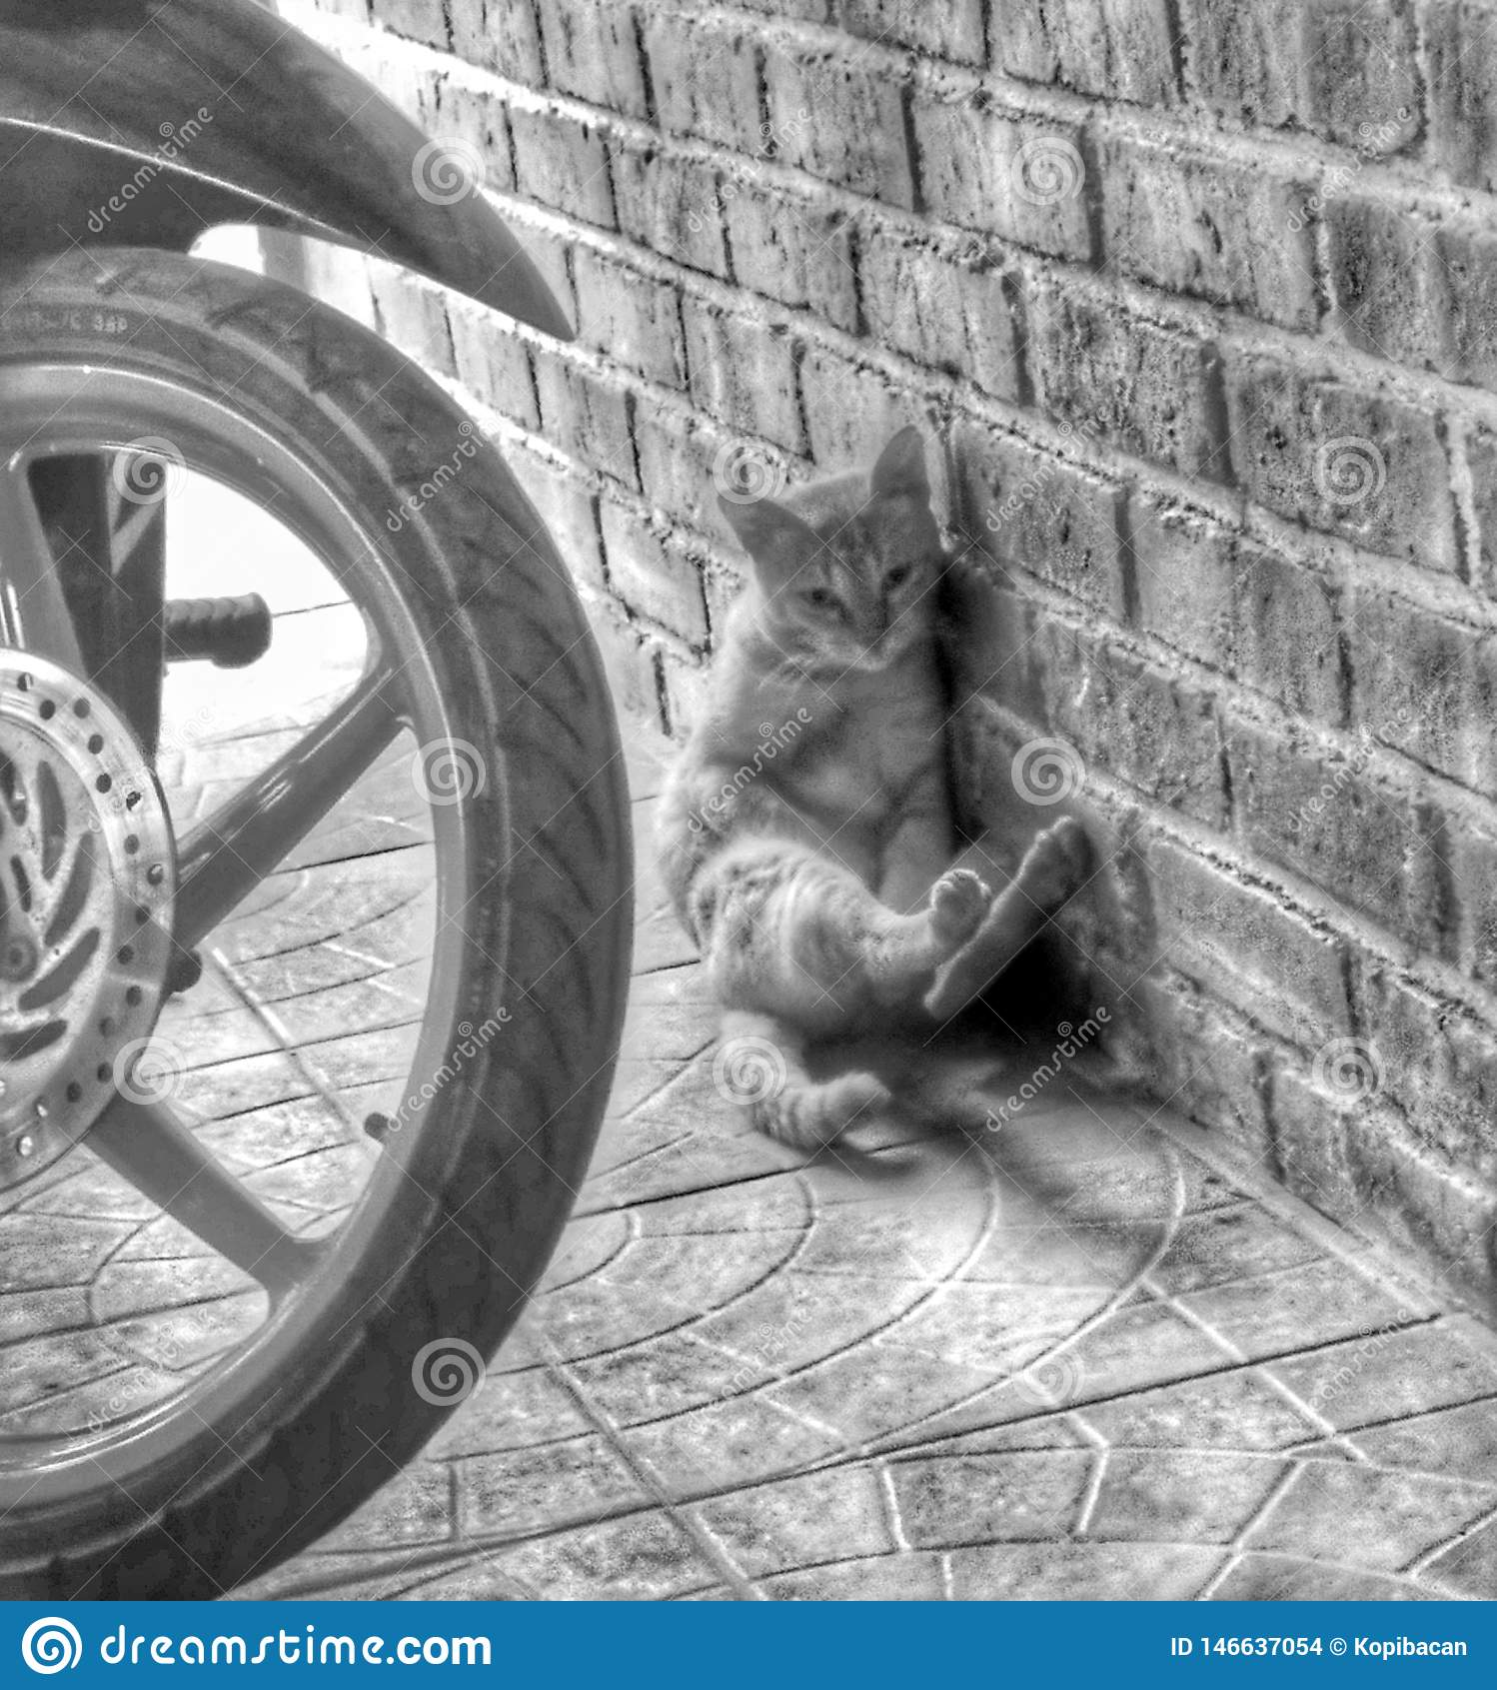 shy shy cat beside the wall